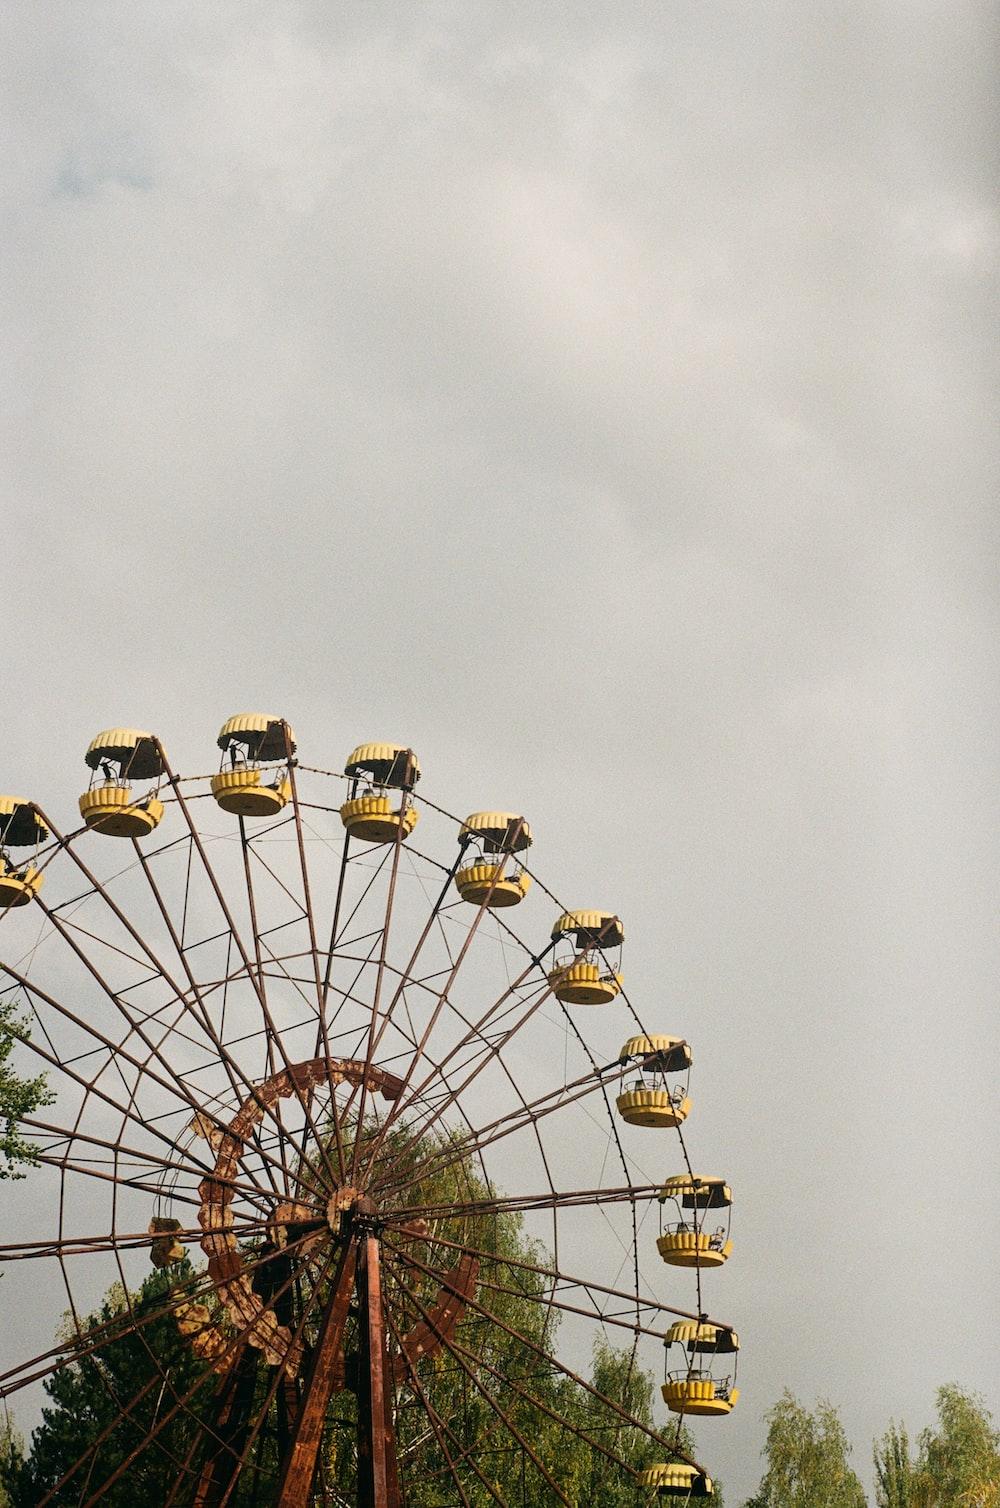 white and yellow ferris wheel under white sky